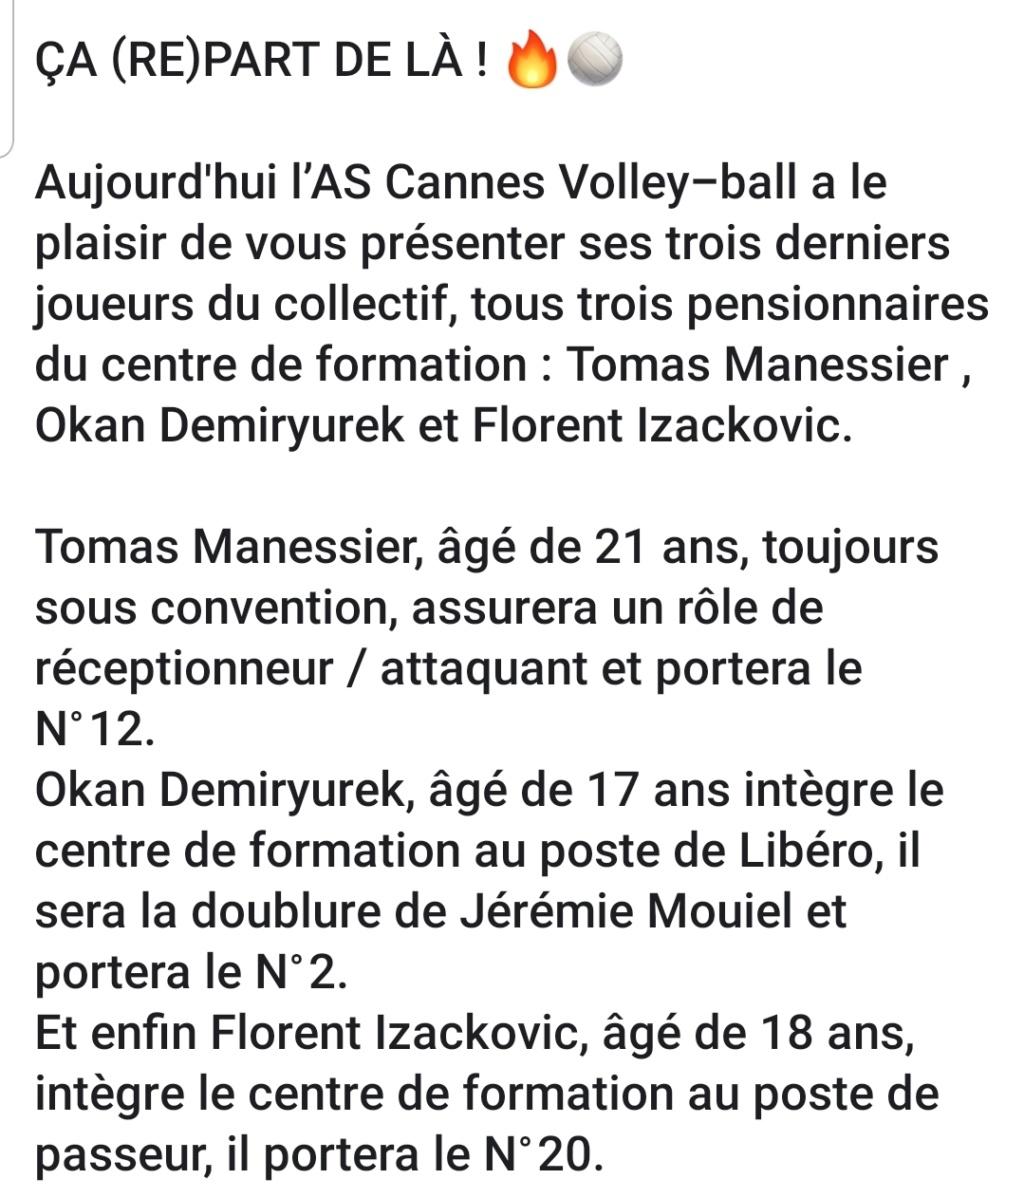 [Ligue A] Transferts 2019-2020 - Page 39 Screen16